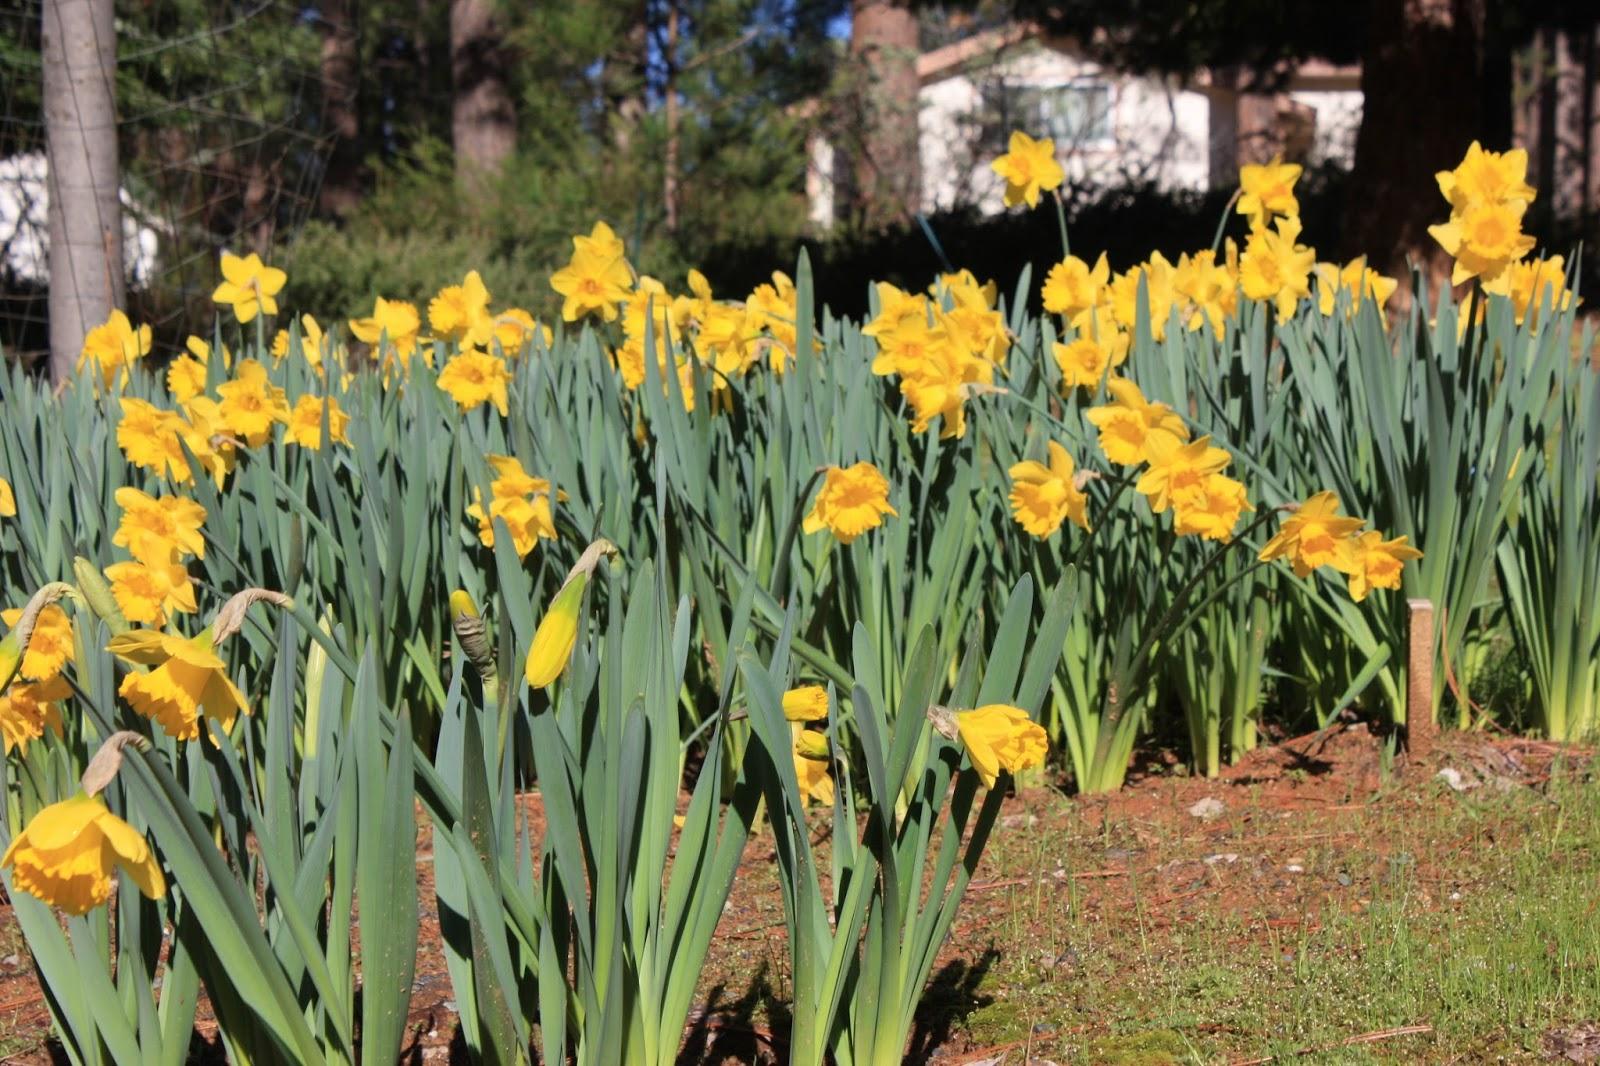 daffodil day - photo #37